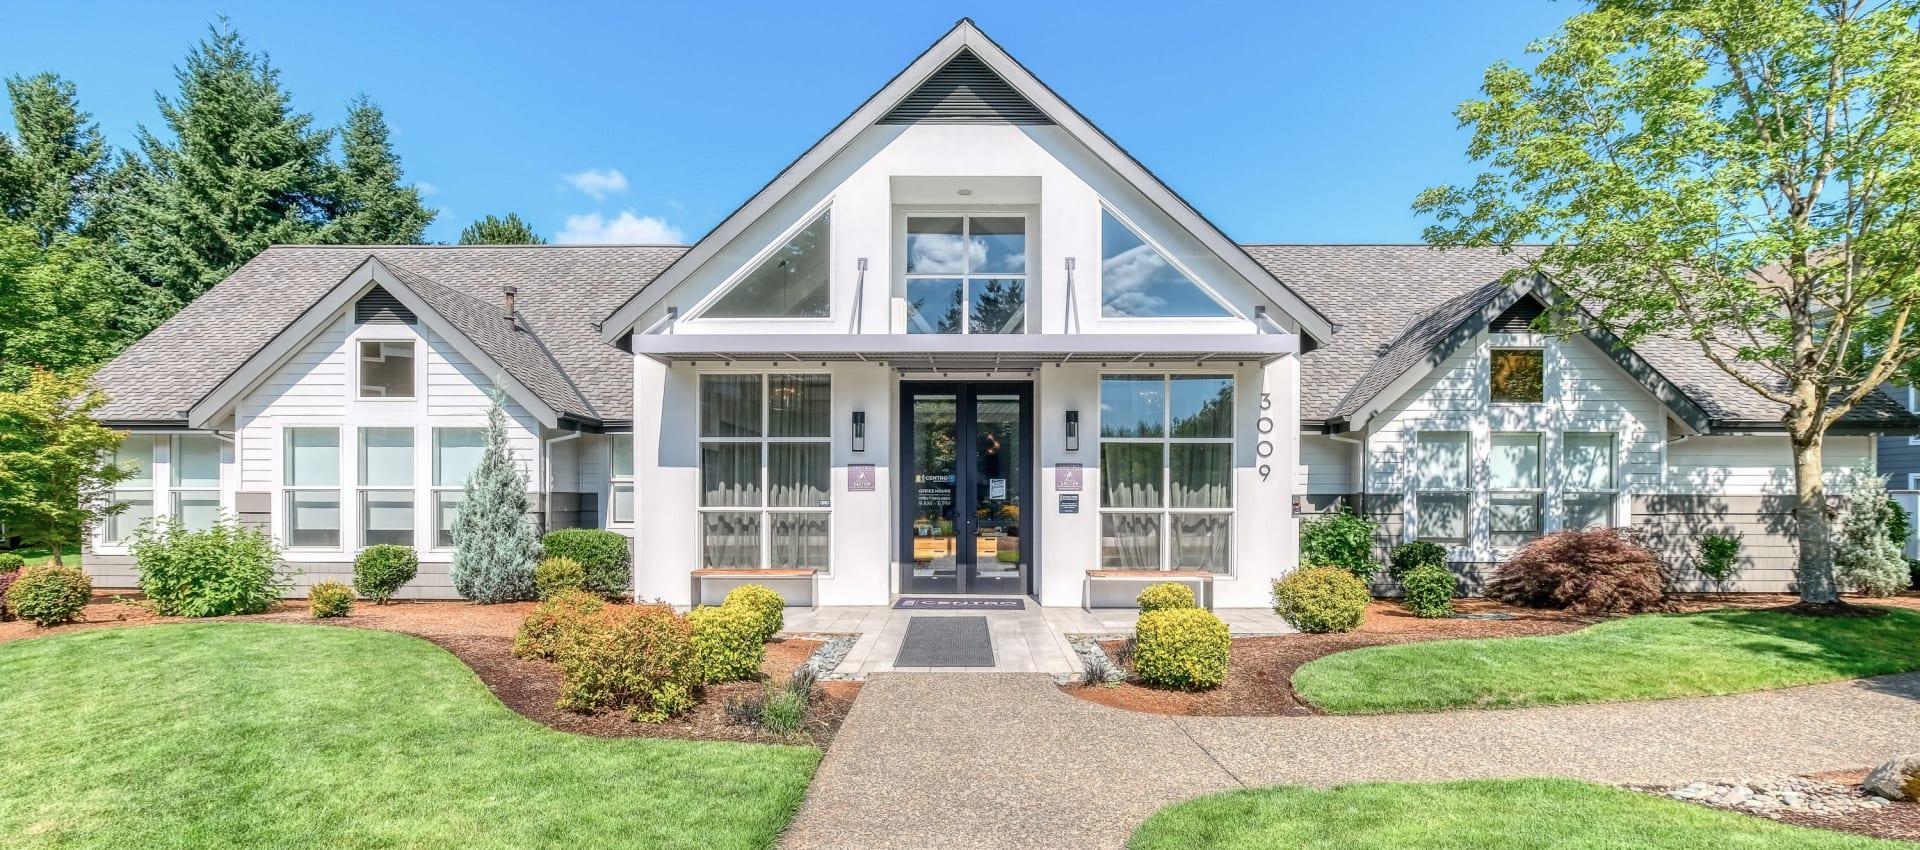 Welcome to Centro Apartment Homes in Hillsboro, Oregon